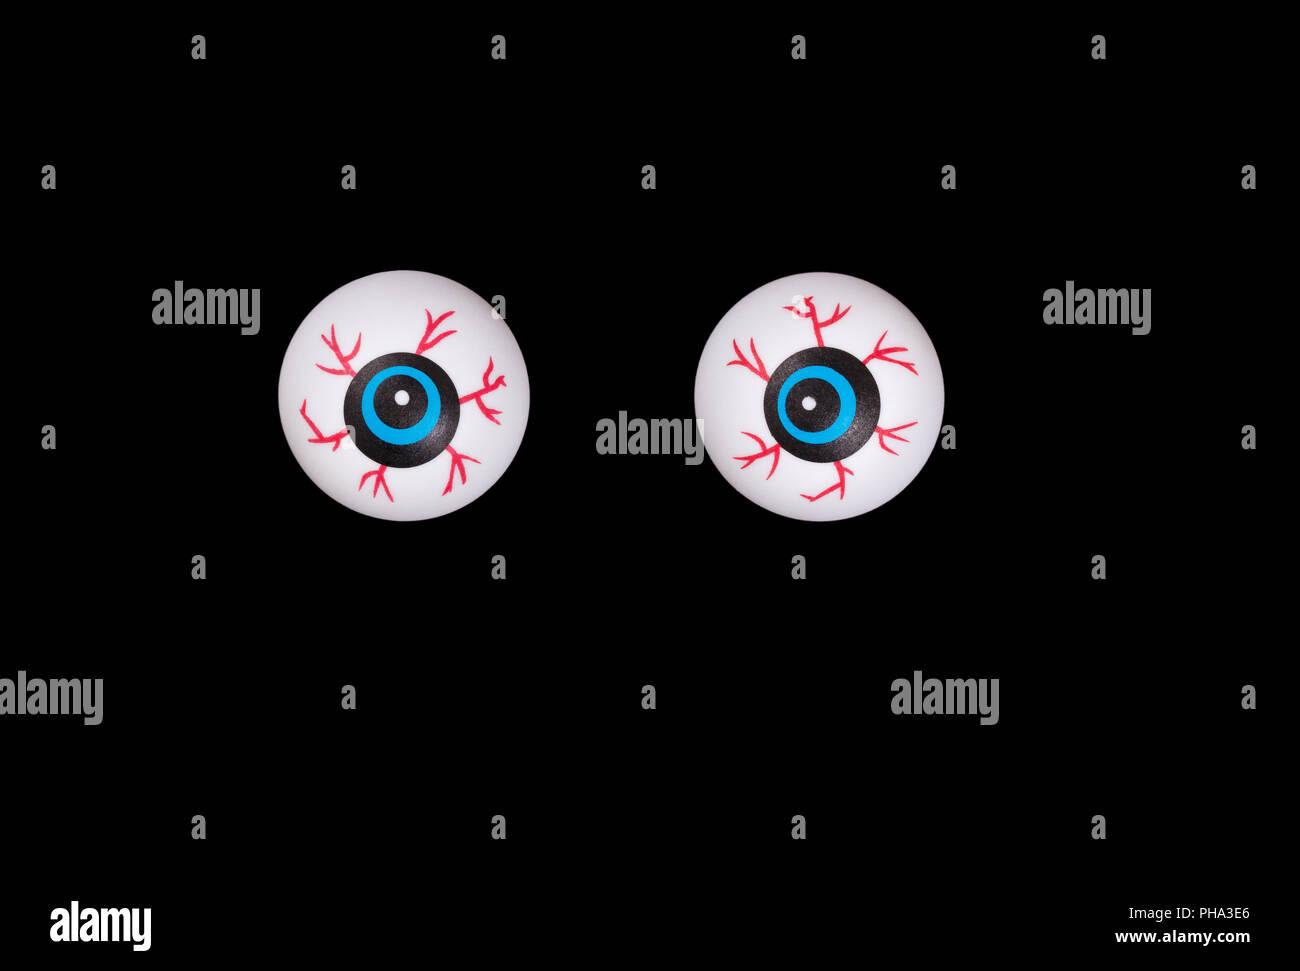 Scary eyeballs for Halloween isolated on black background - Stock Image